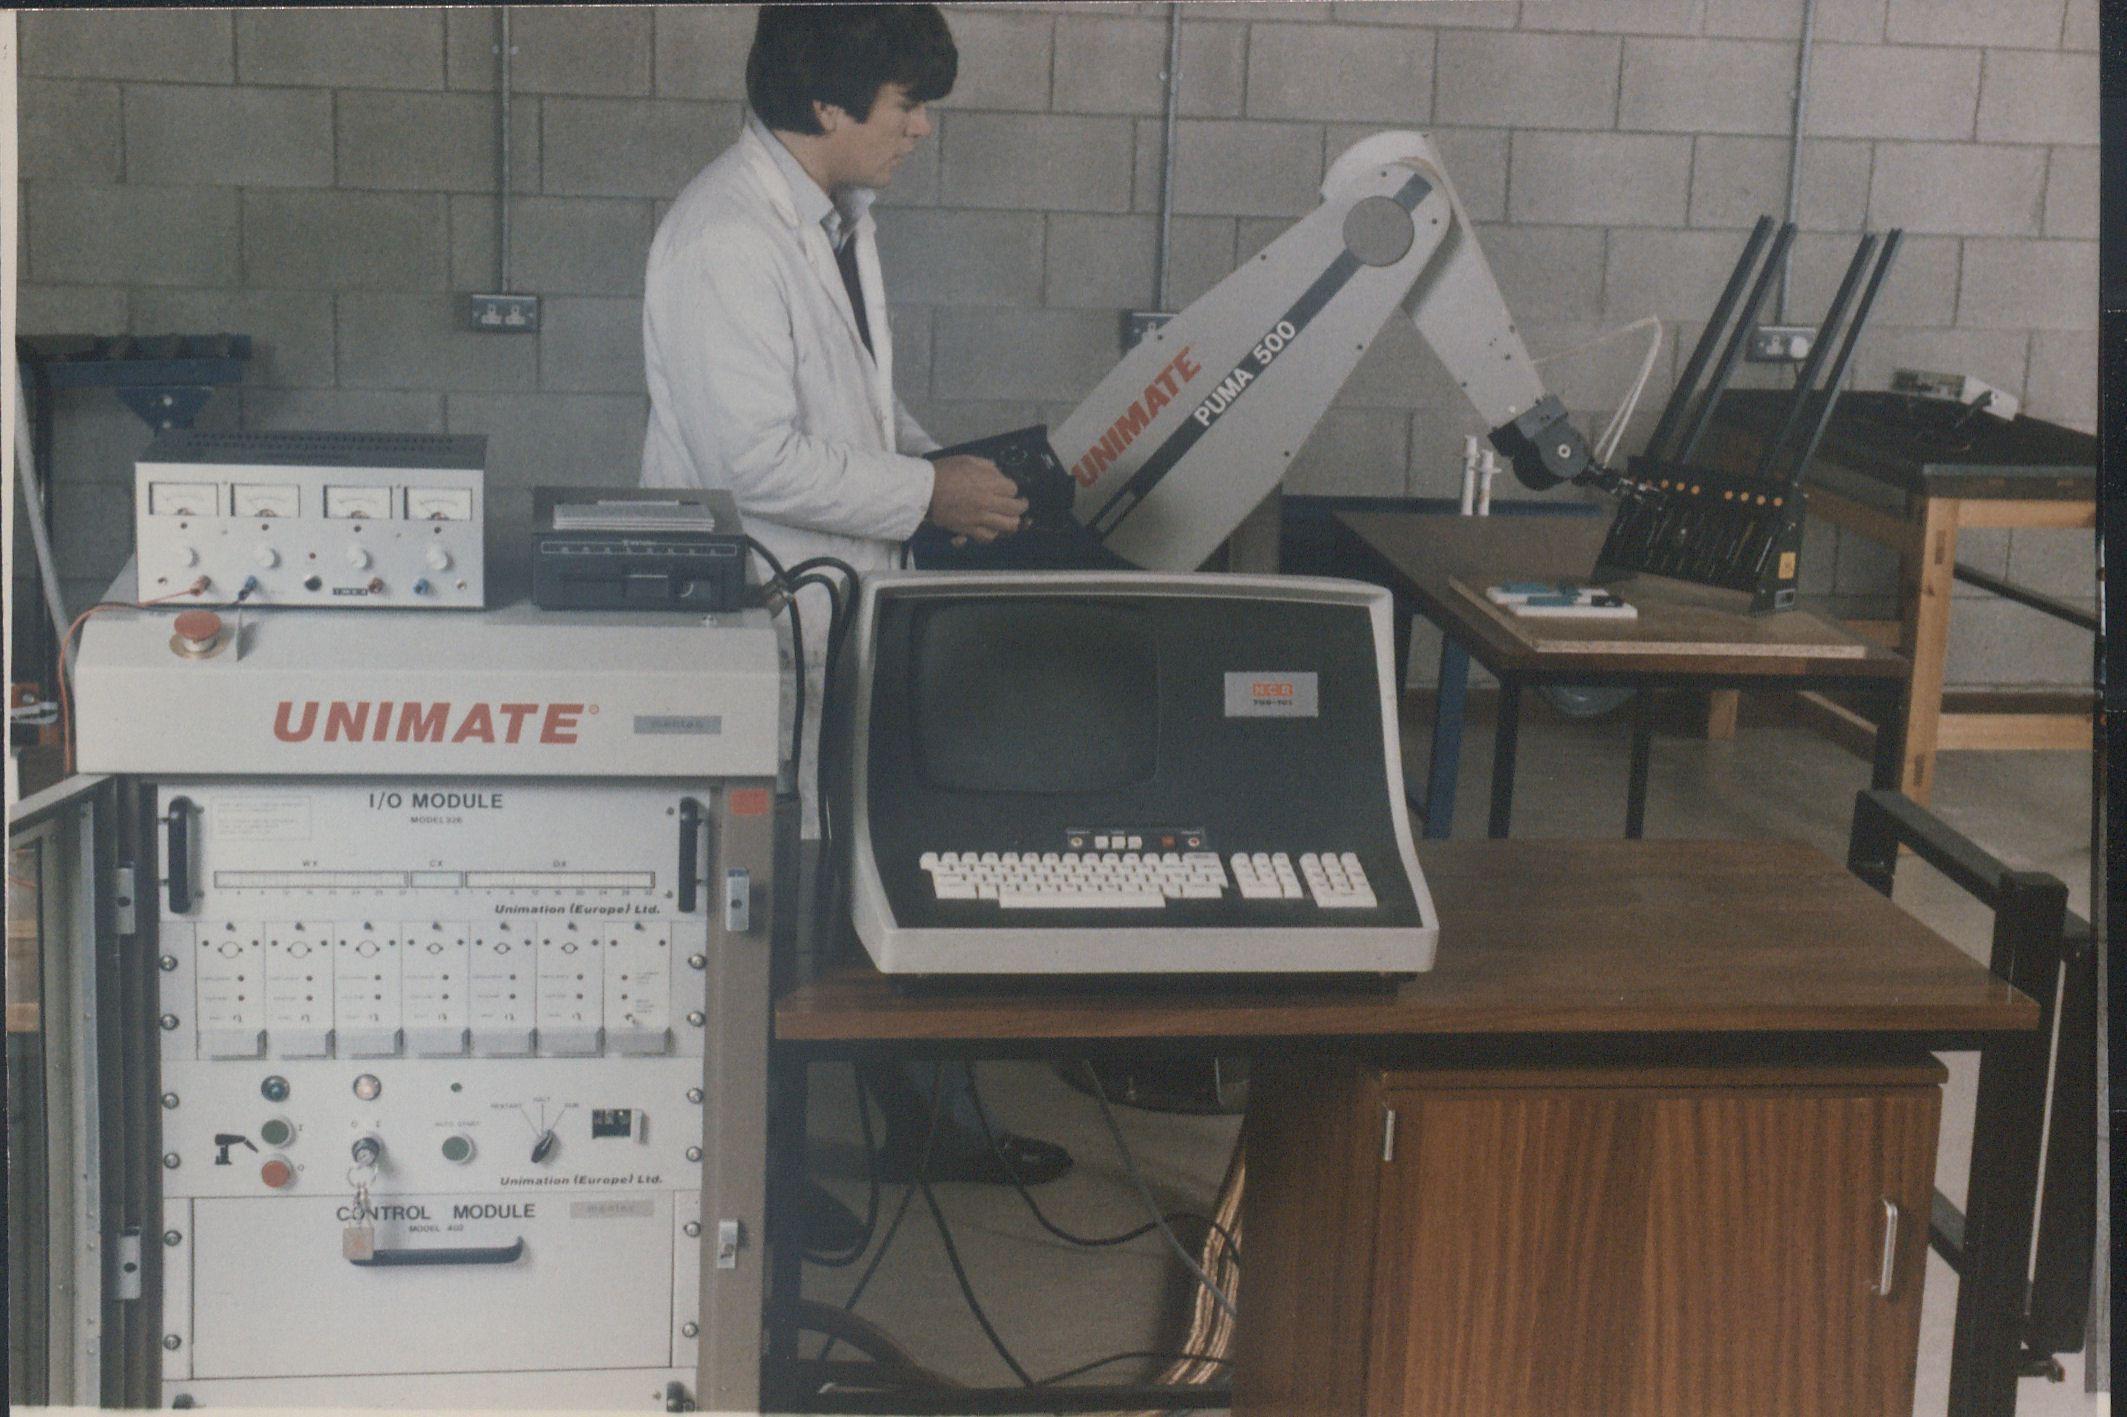 Robot Unimate, revolución automatización industrial